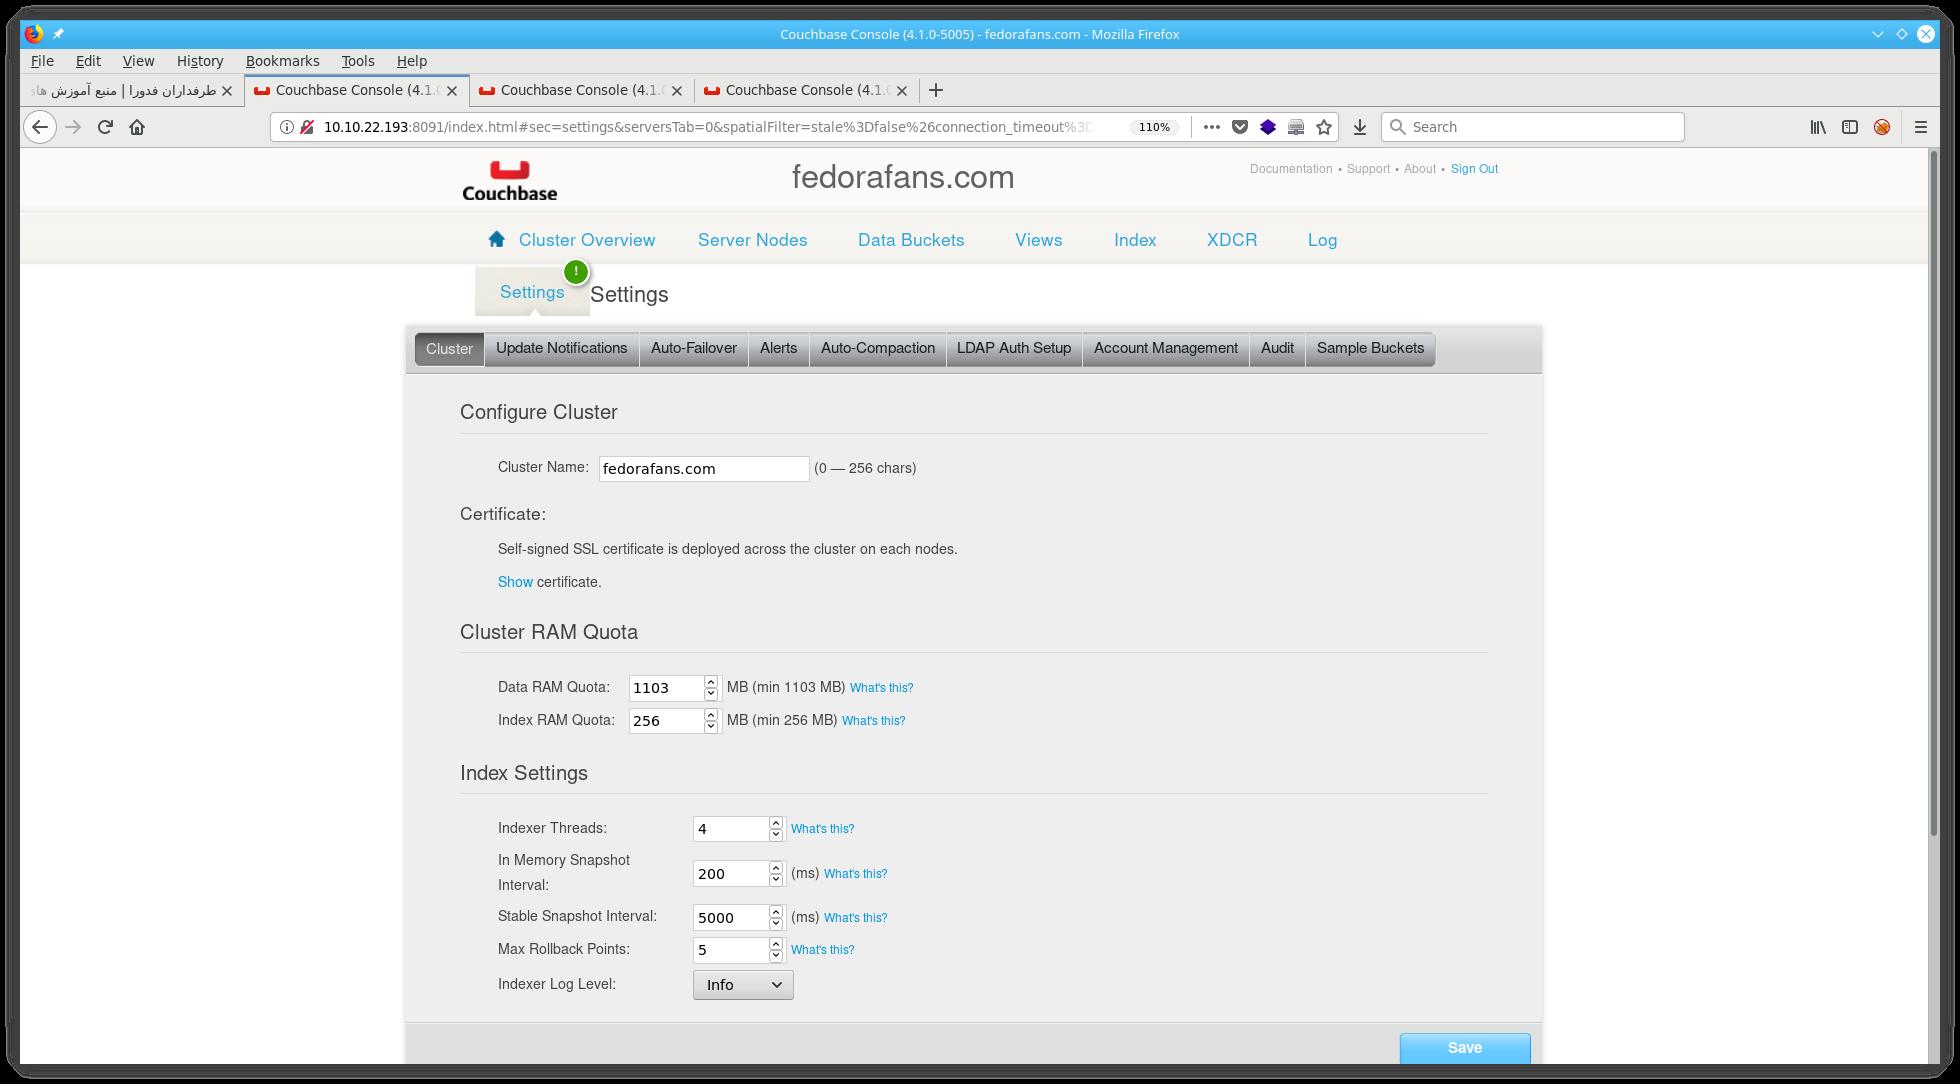 9-couchbase-server-fedorafans.com